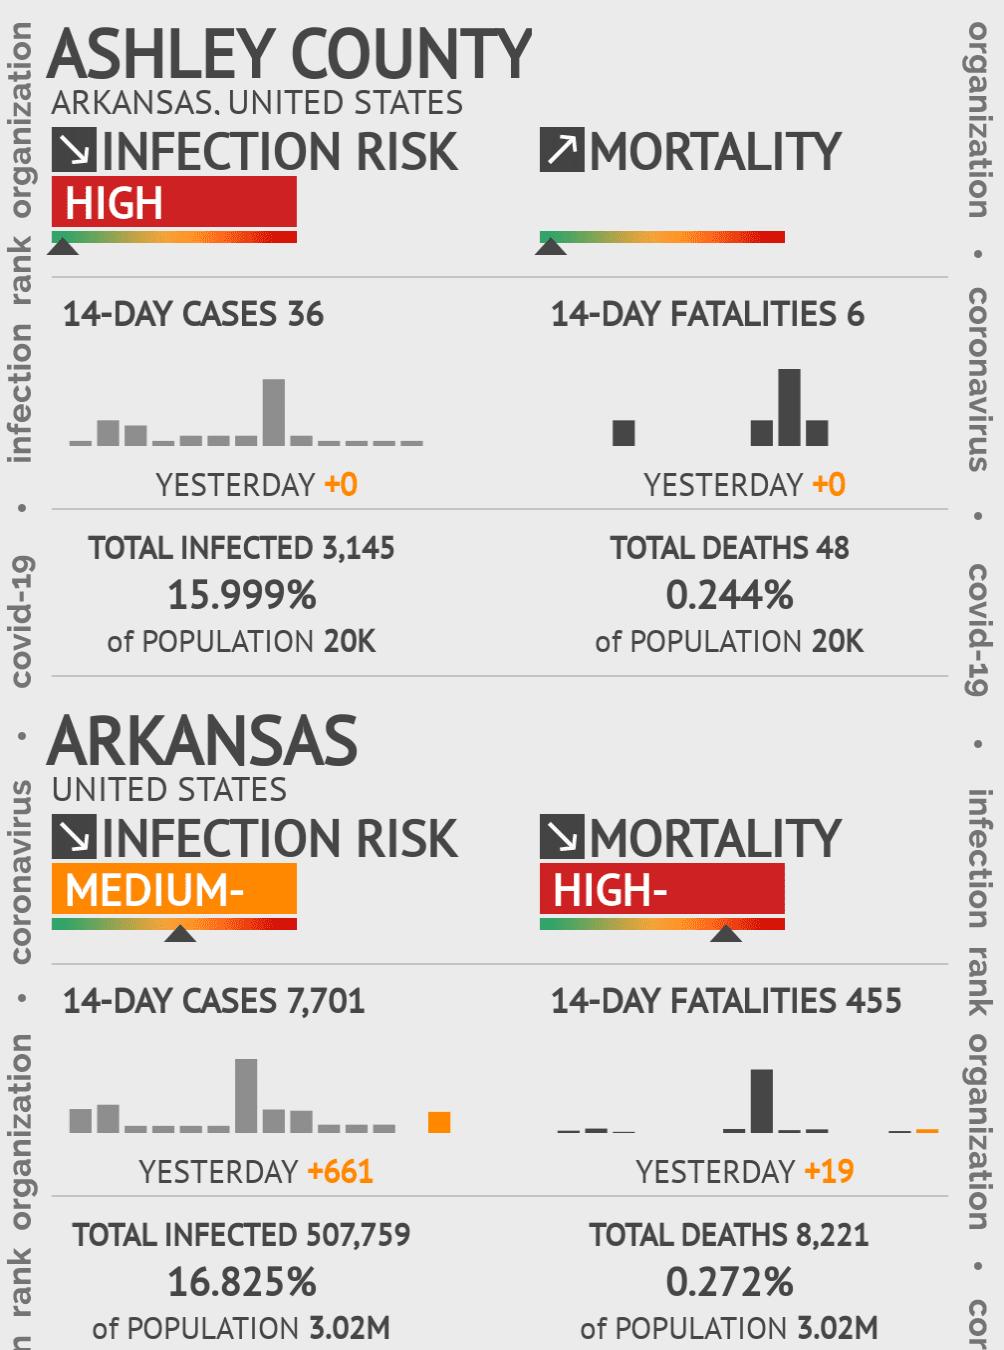 Ashley County Coronavirus Covid-19 Risk of Infection on July 24, 2021